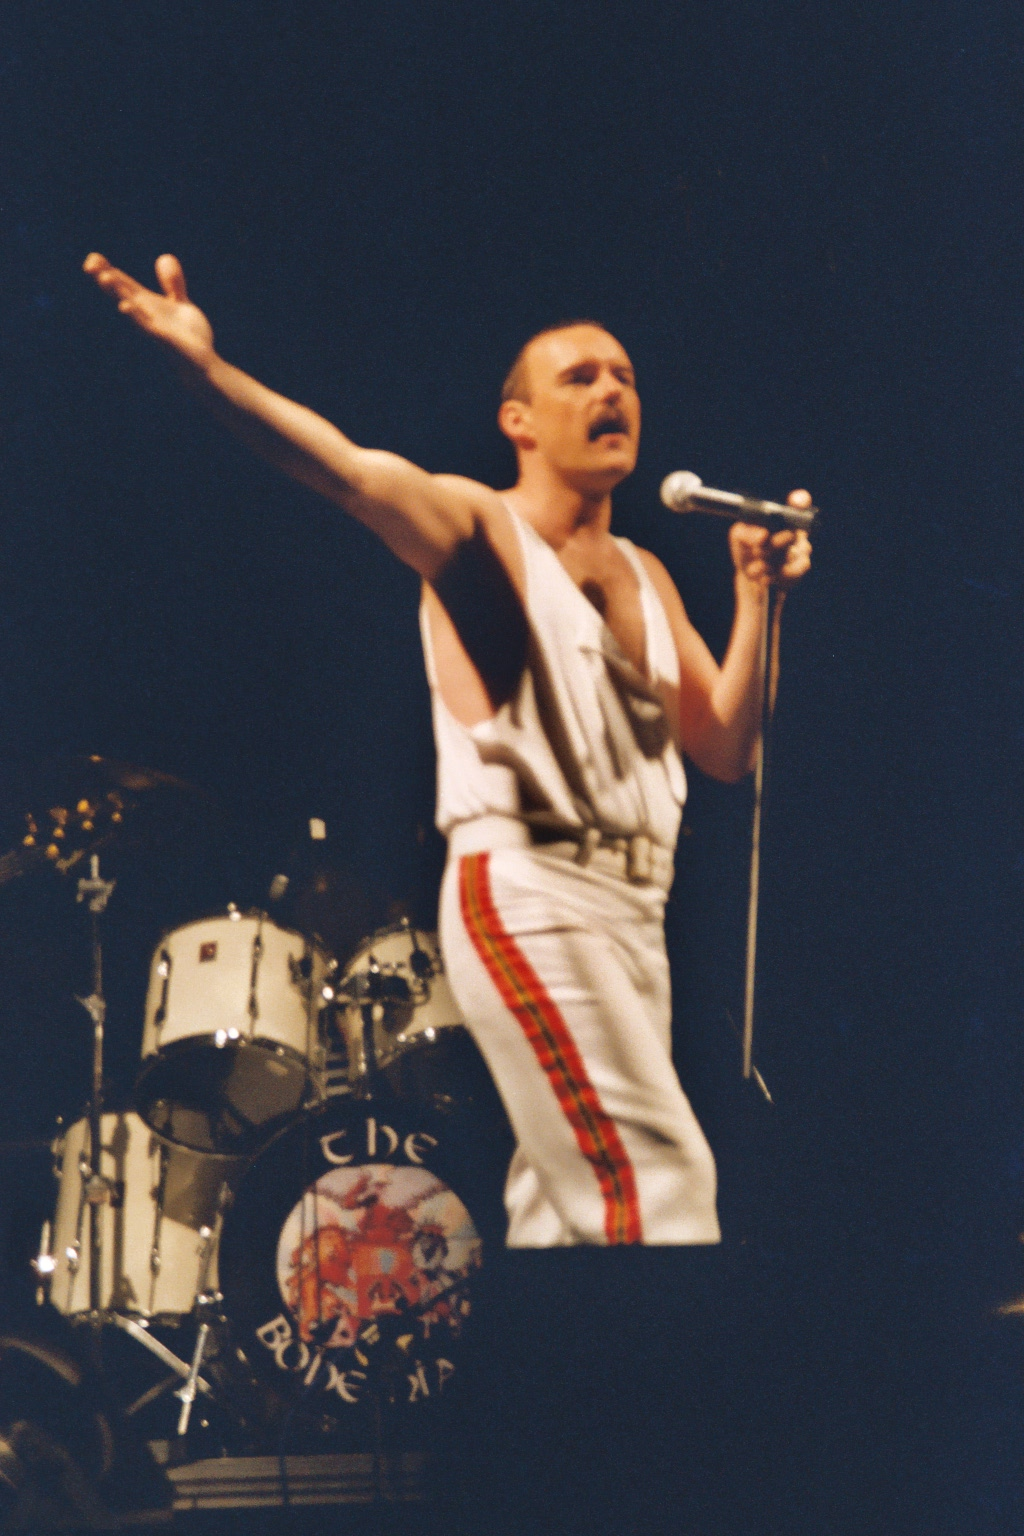 favourite queen member freddie favourite queen song show must go on previous bands empyr heavy rock stride progressive rock dibbles beat